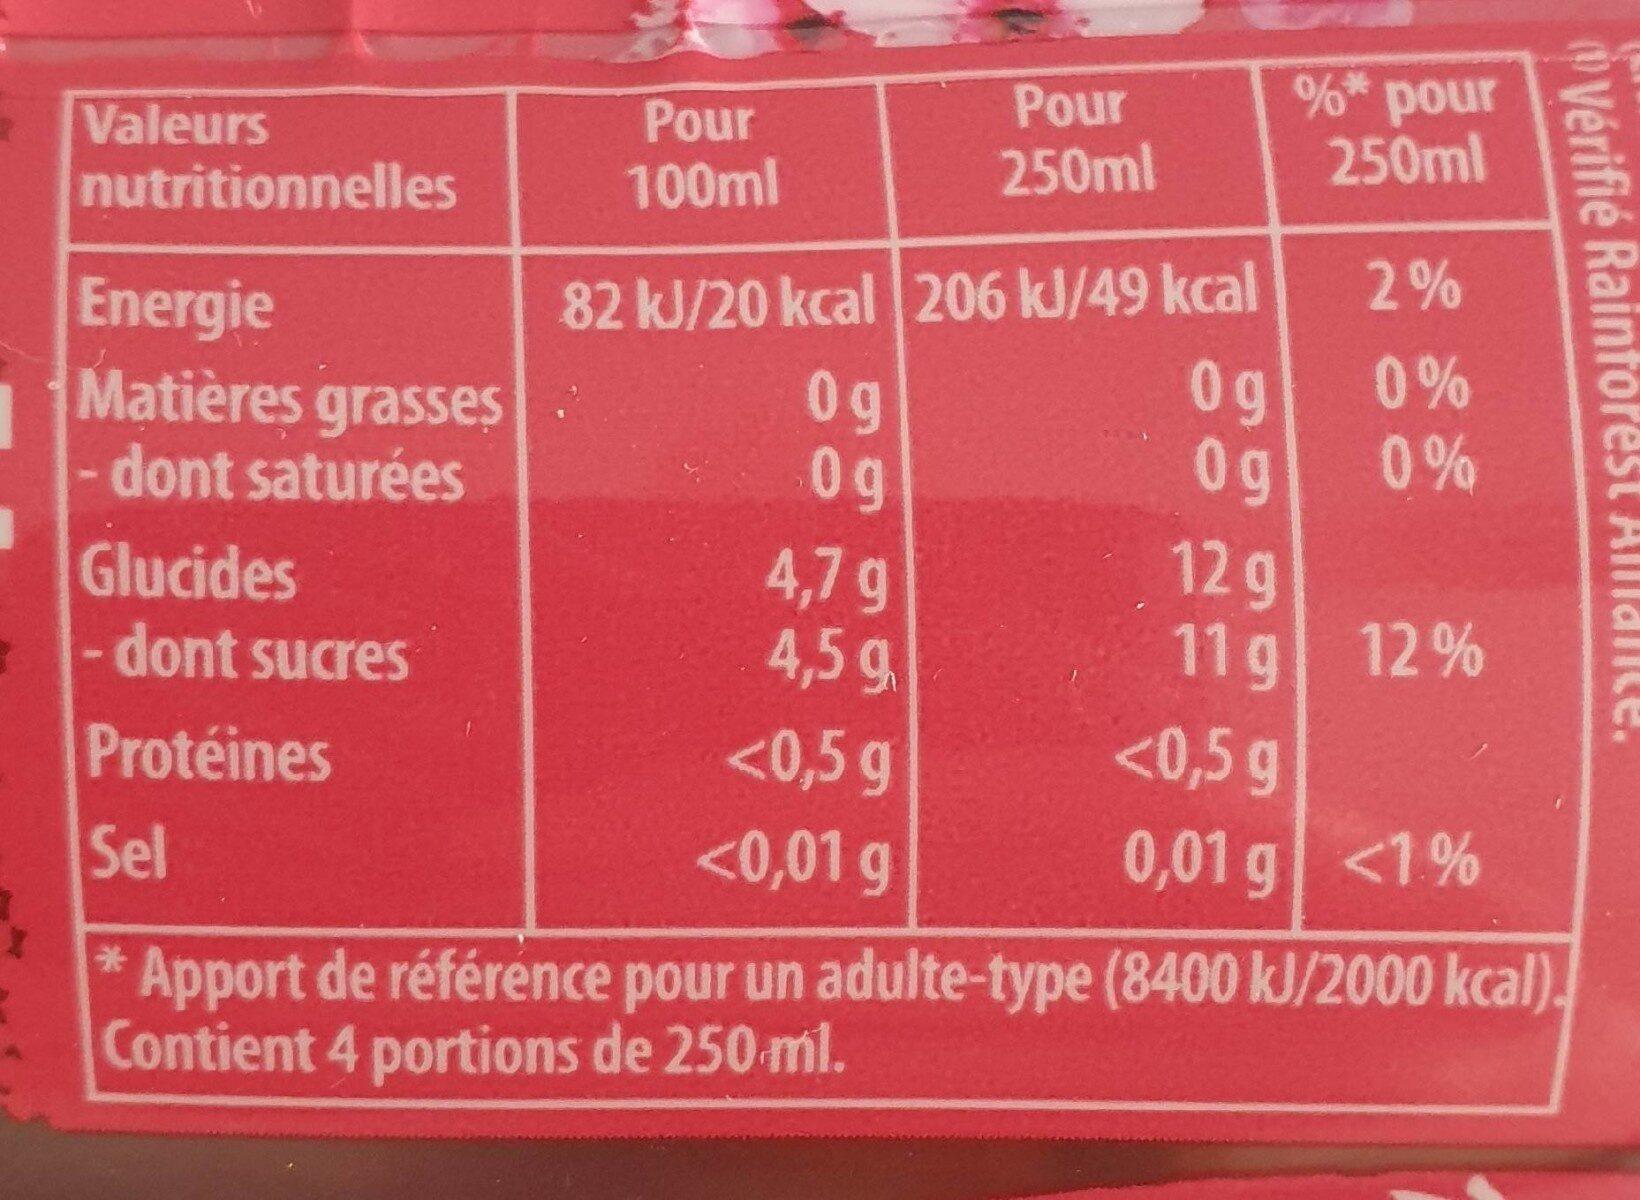 Ice Tea - Framboise et fleur de cerisier - Informazioni nutrizionali - fr